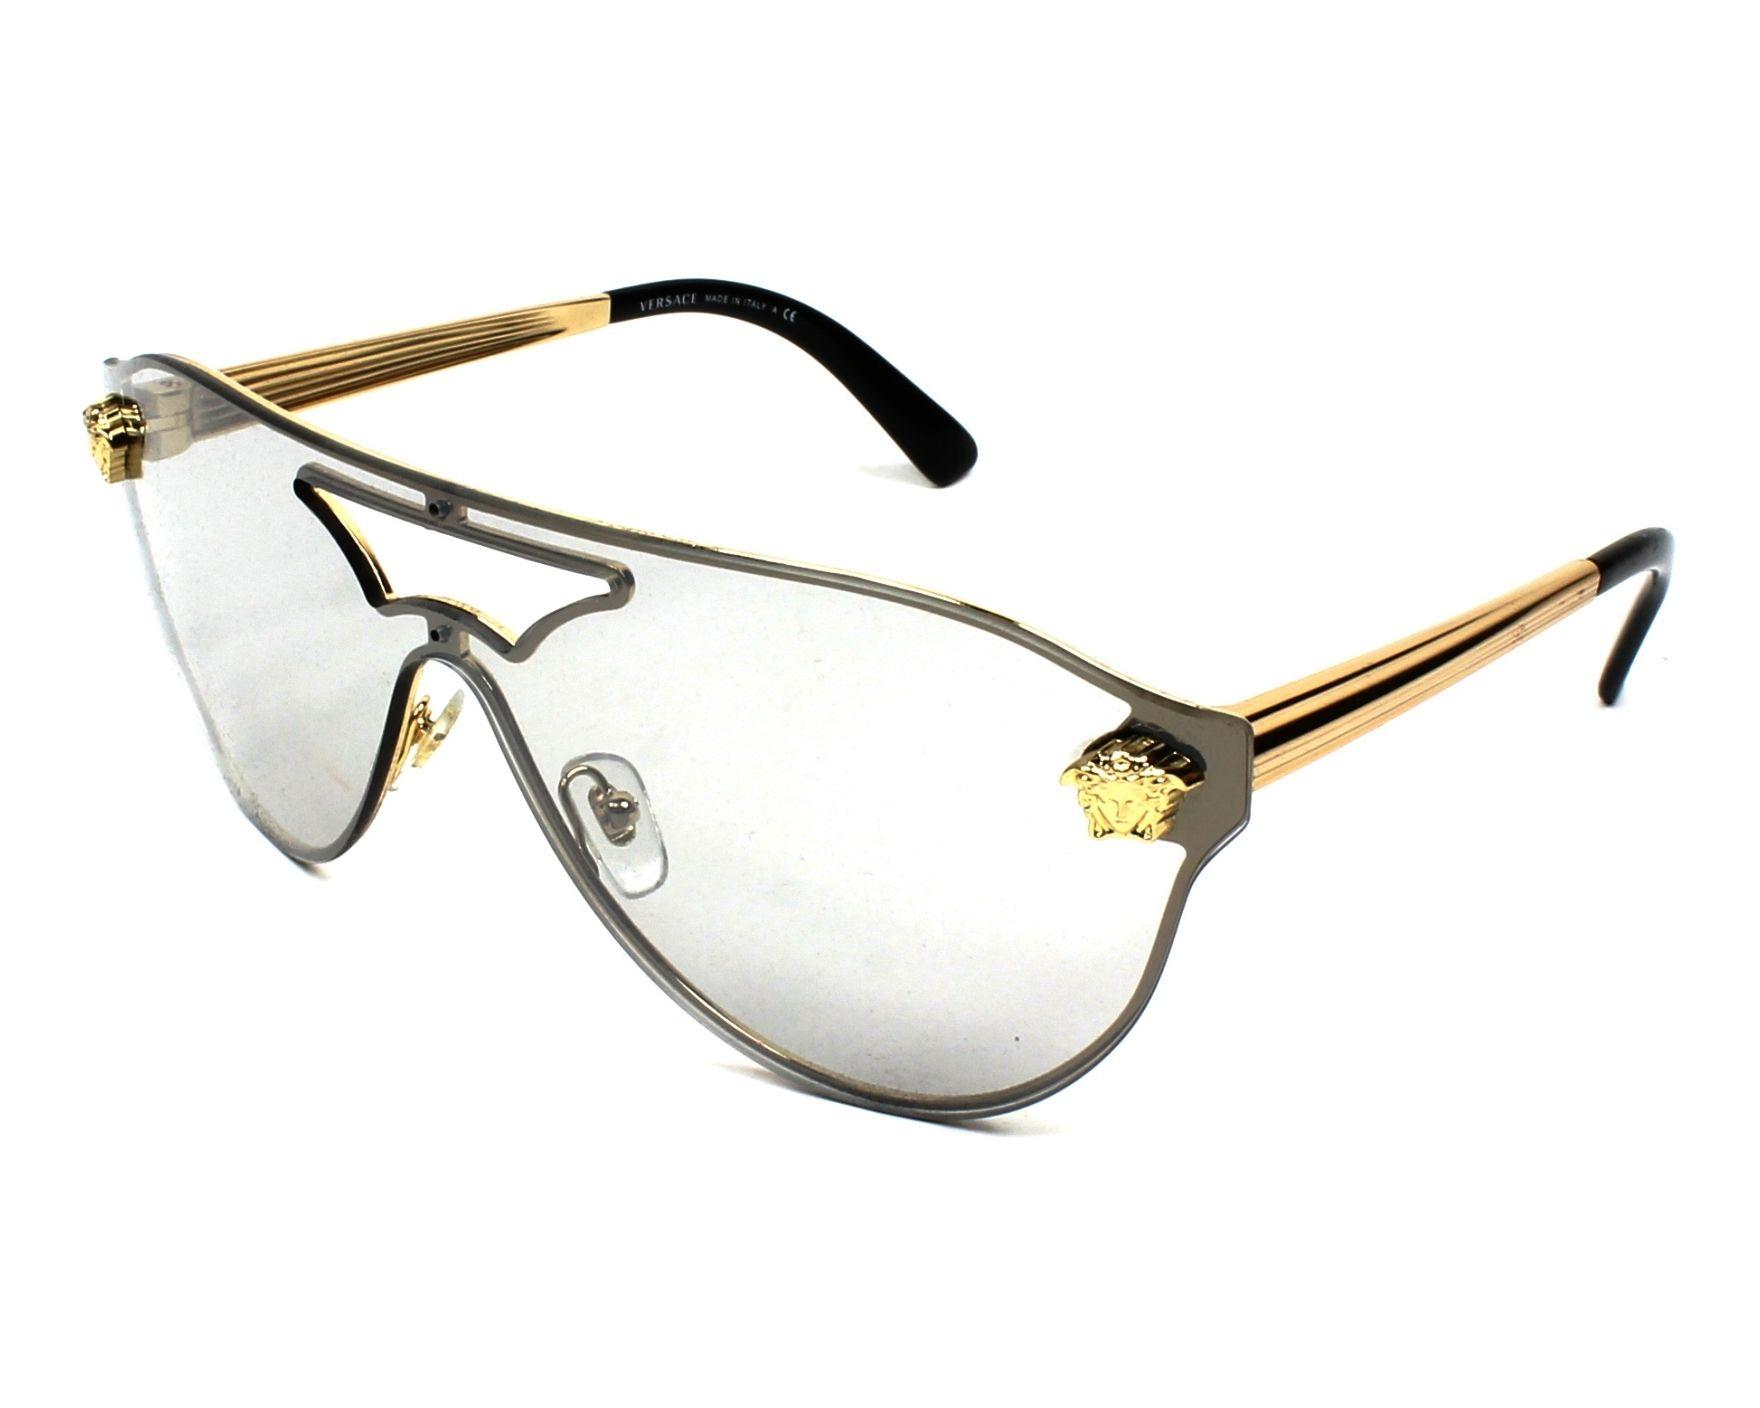 efad69008ac Sunglasses Versace VE-2161 1002 6G 99- Gold profile view